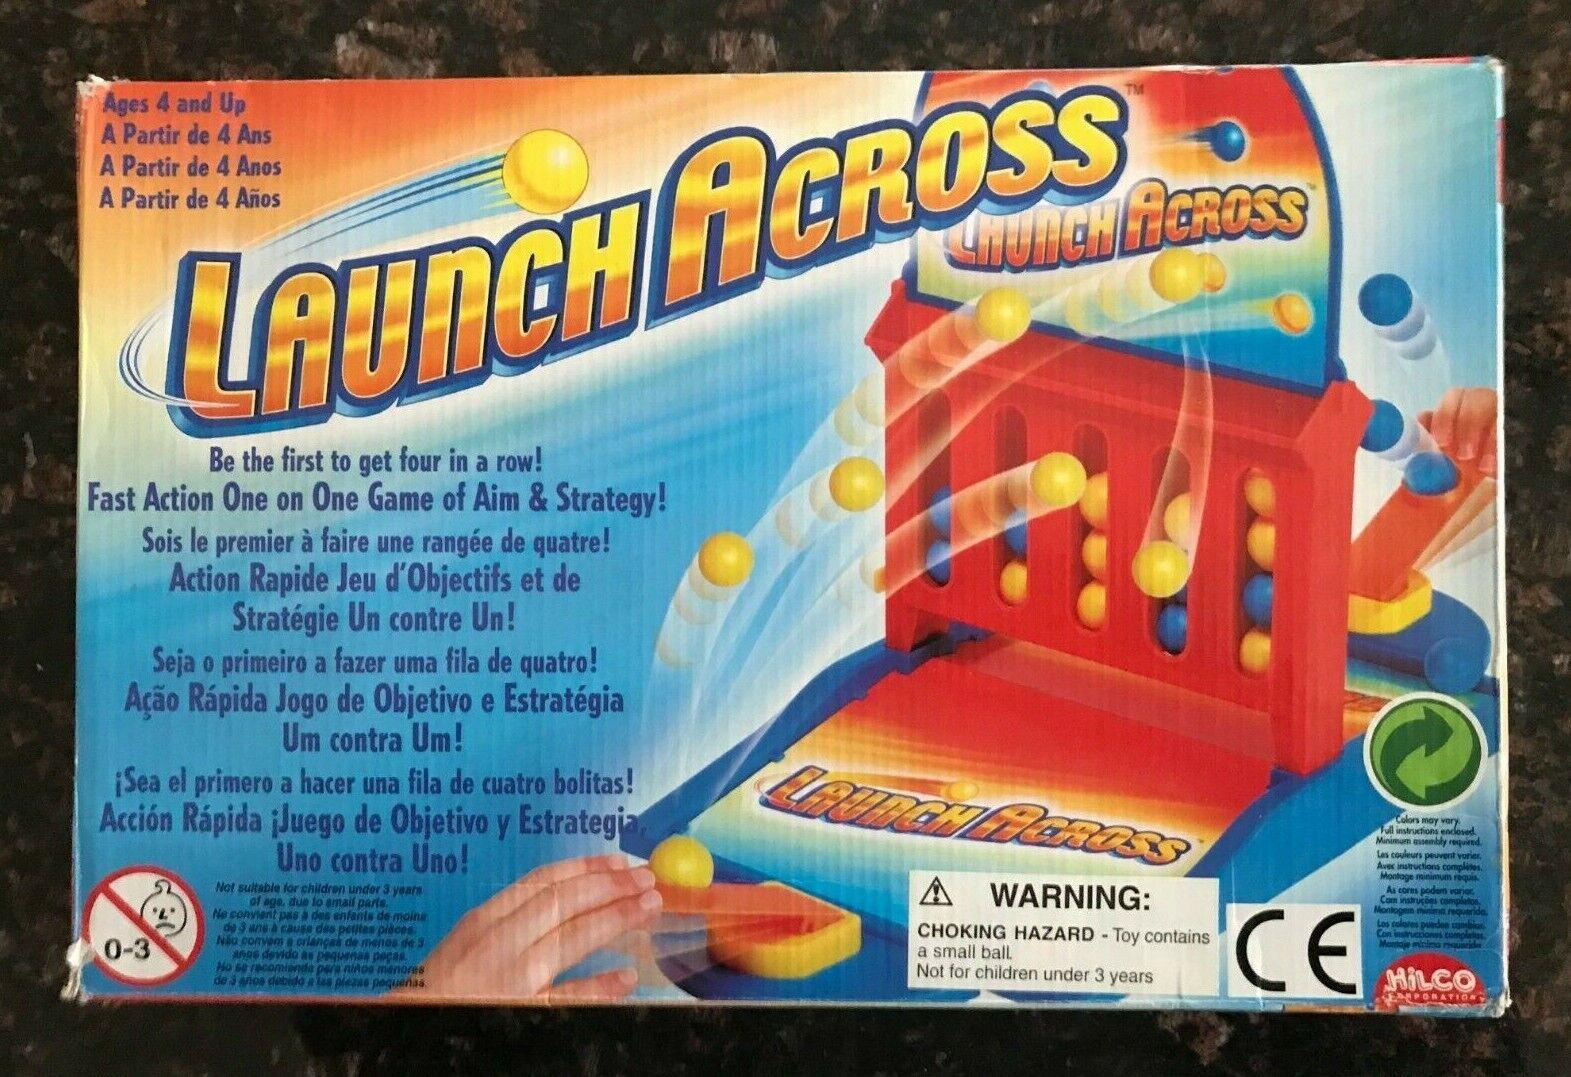 Hilco 2004 2004 2004 Launch Across Game VERY RARE beb20f